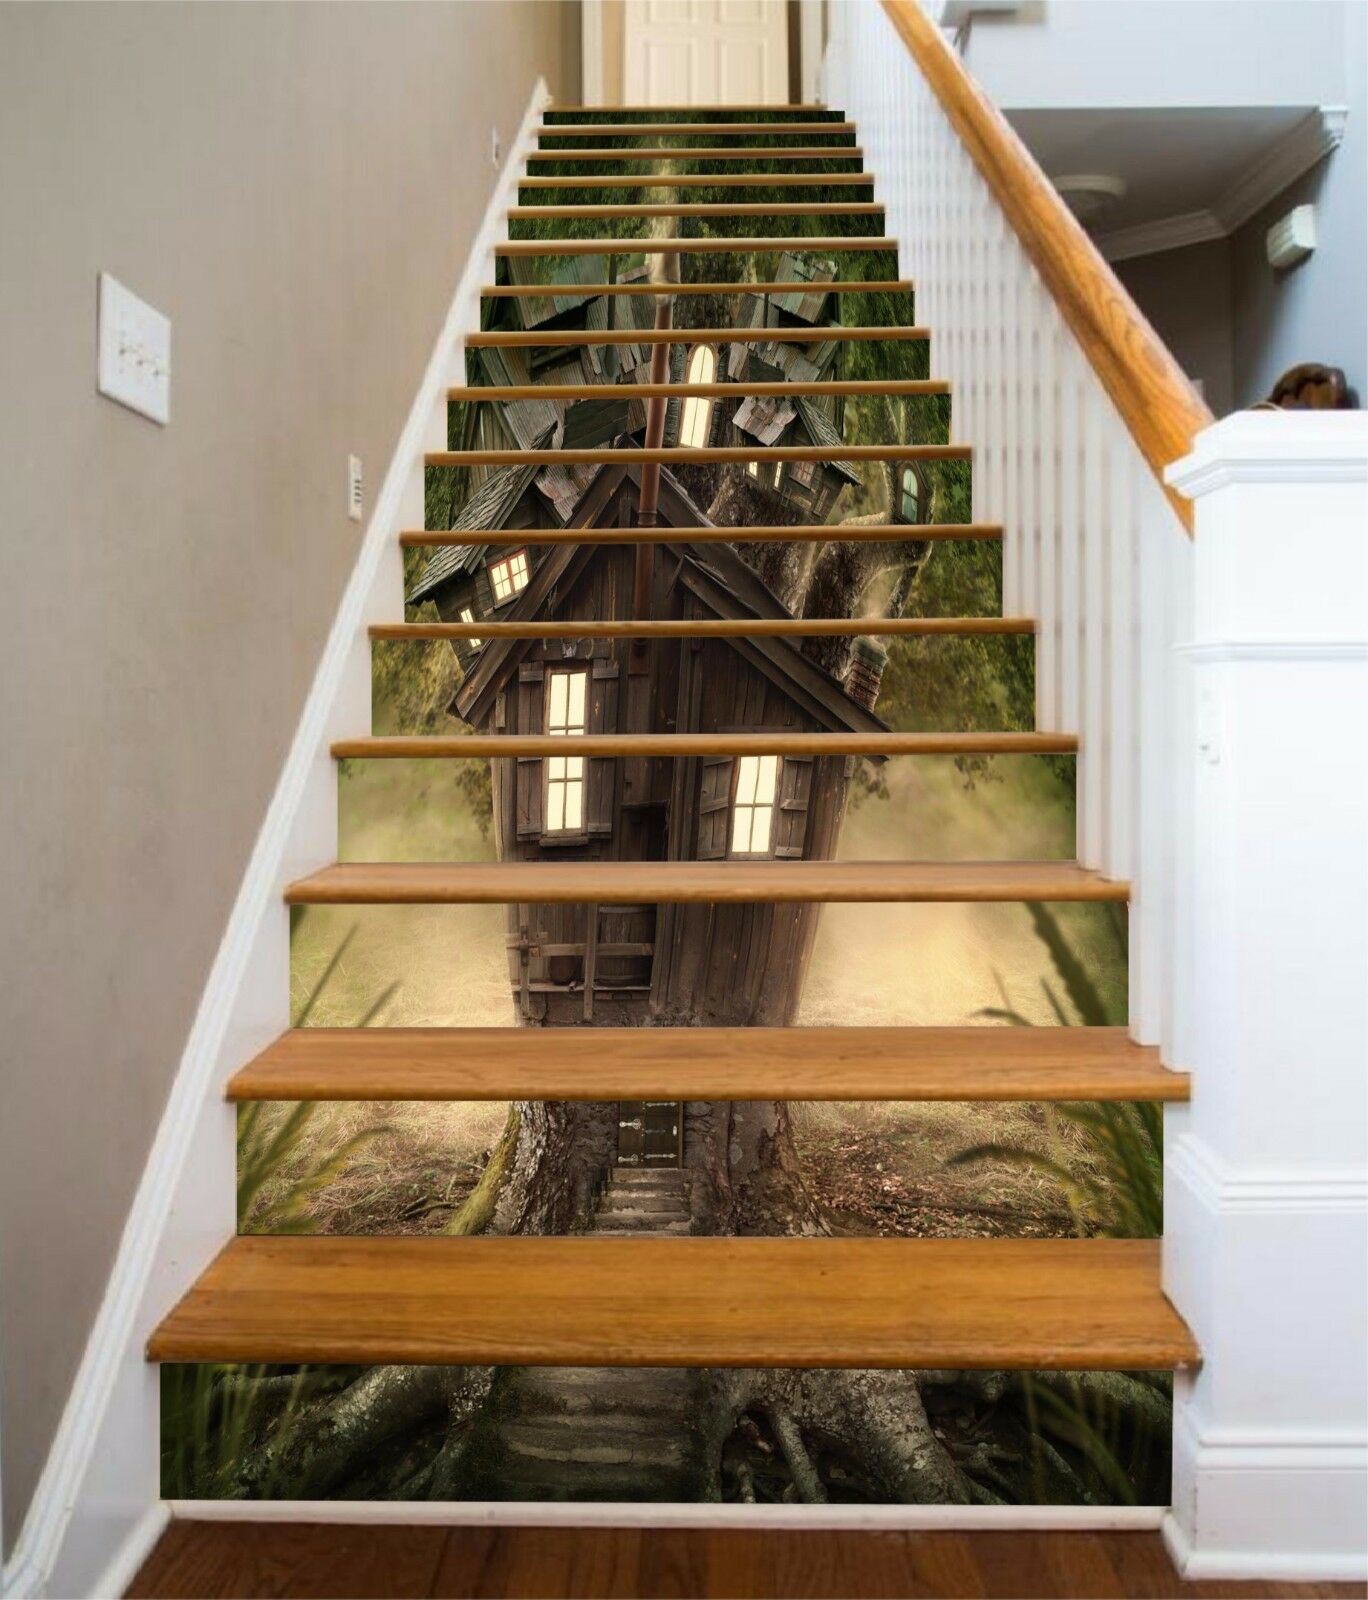 3D Wood House 841 Stair Risers Decoration Photo Mural Vinyl Decal Wallpaper AU